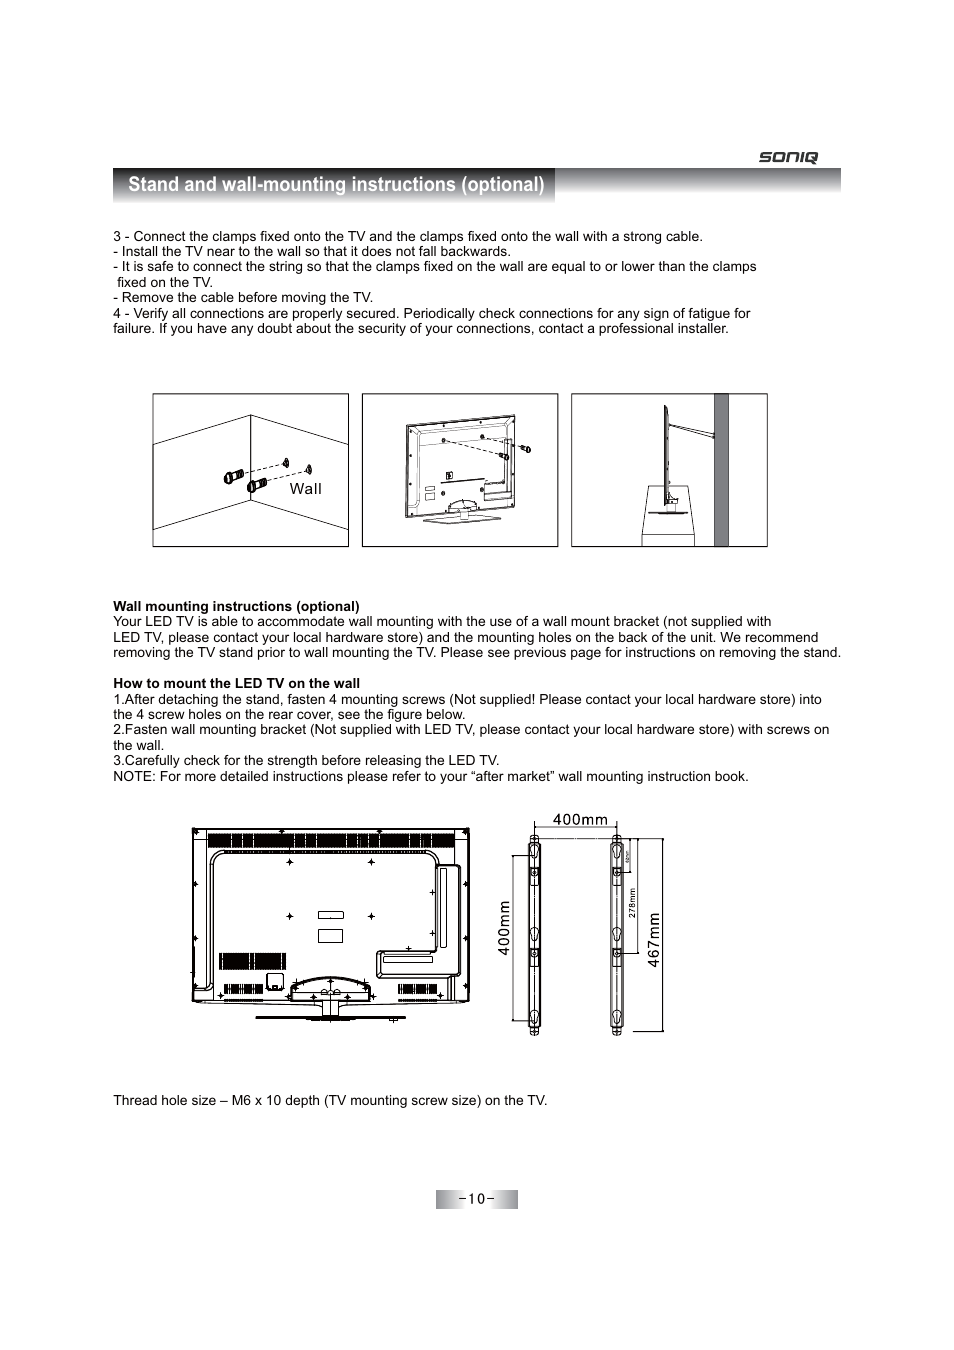 soniq tv wall mount instructions